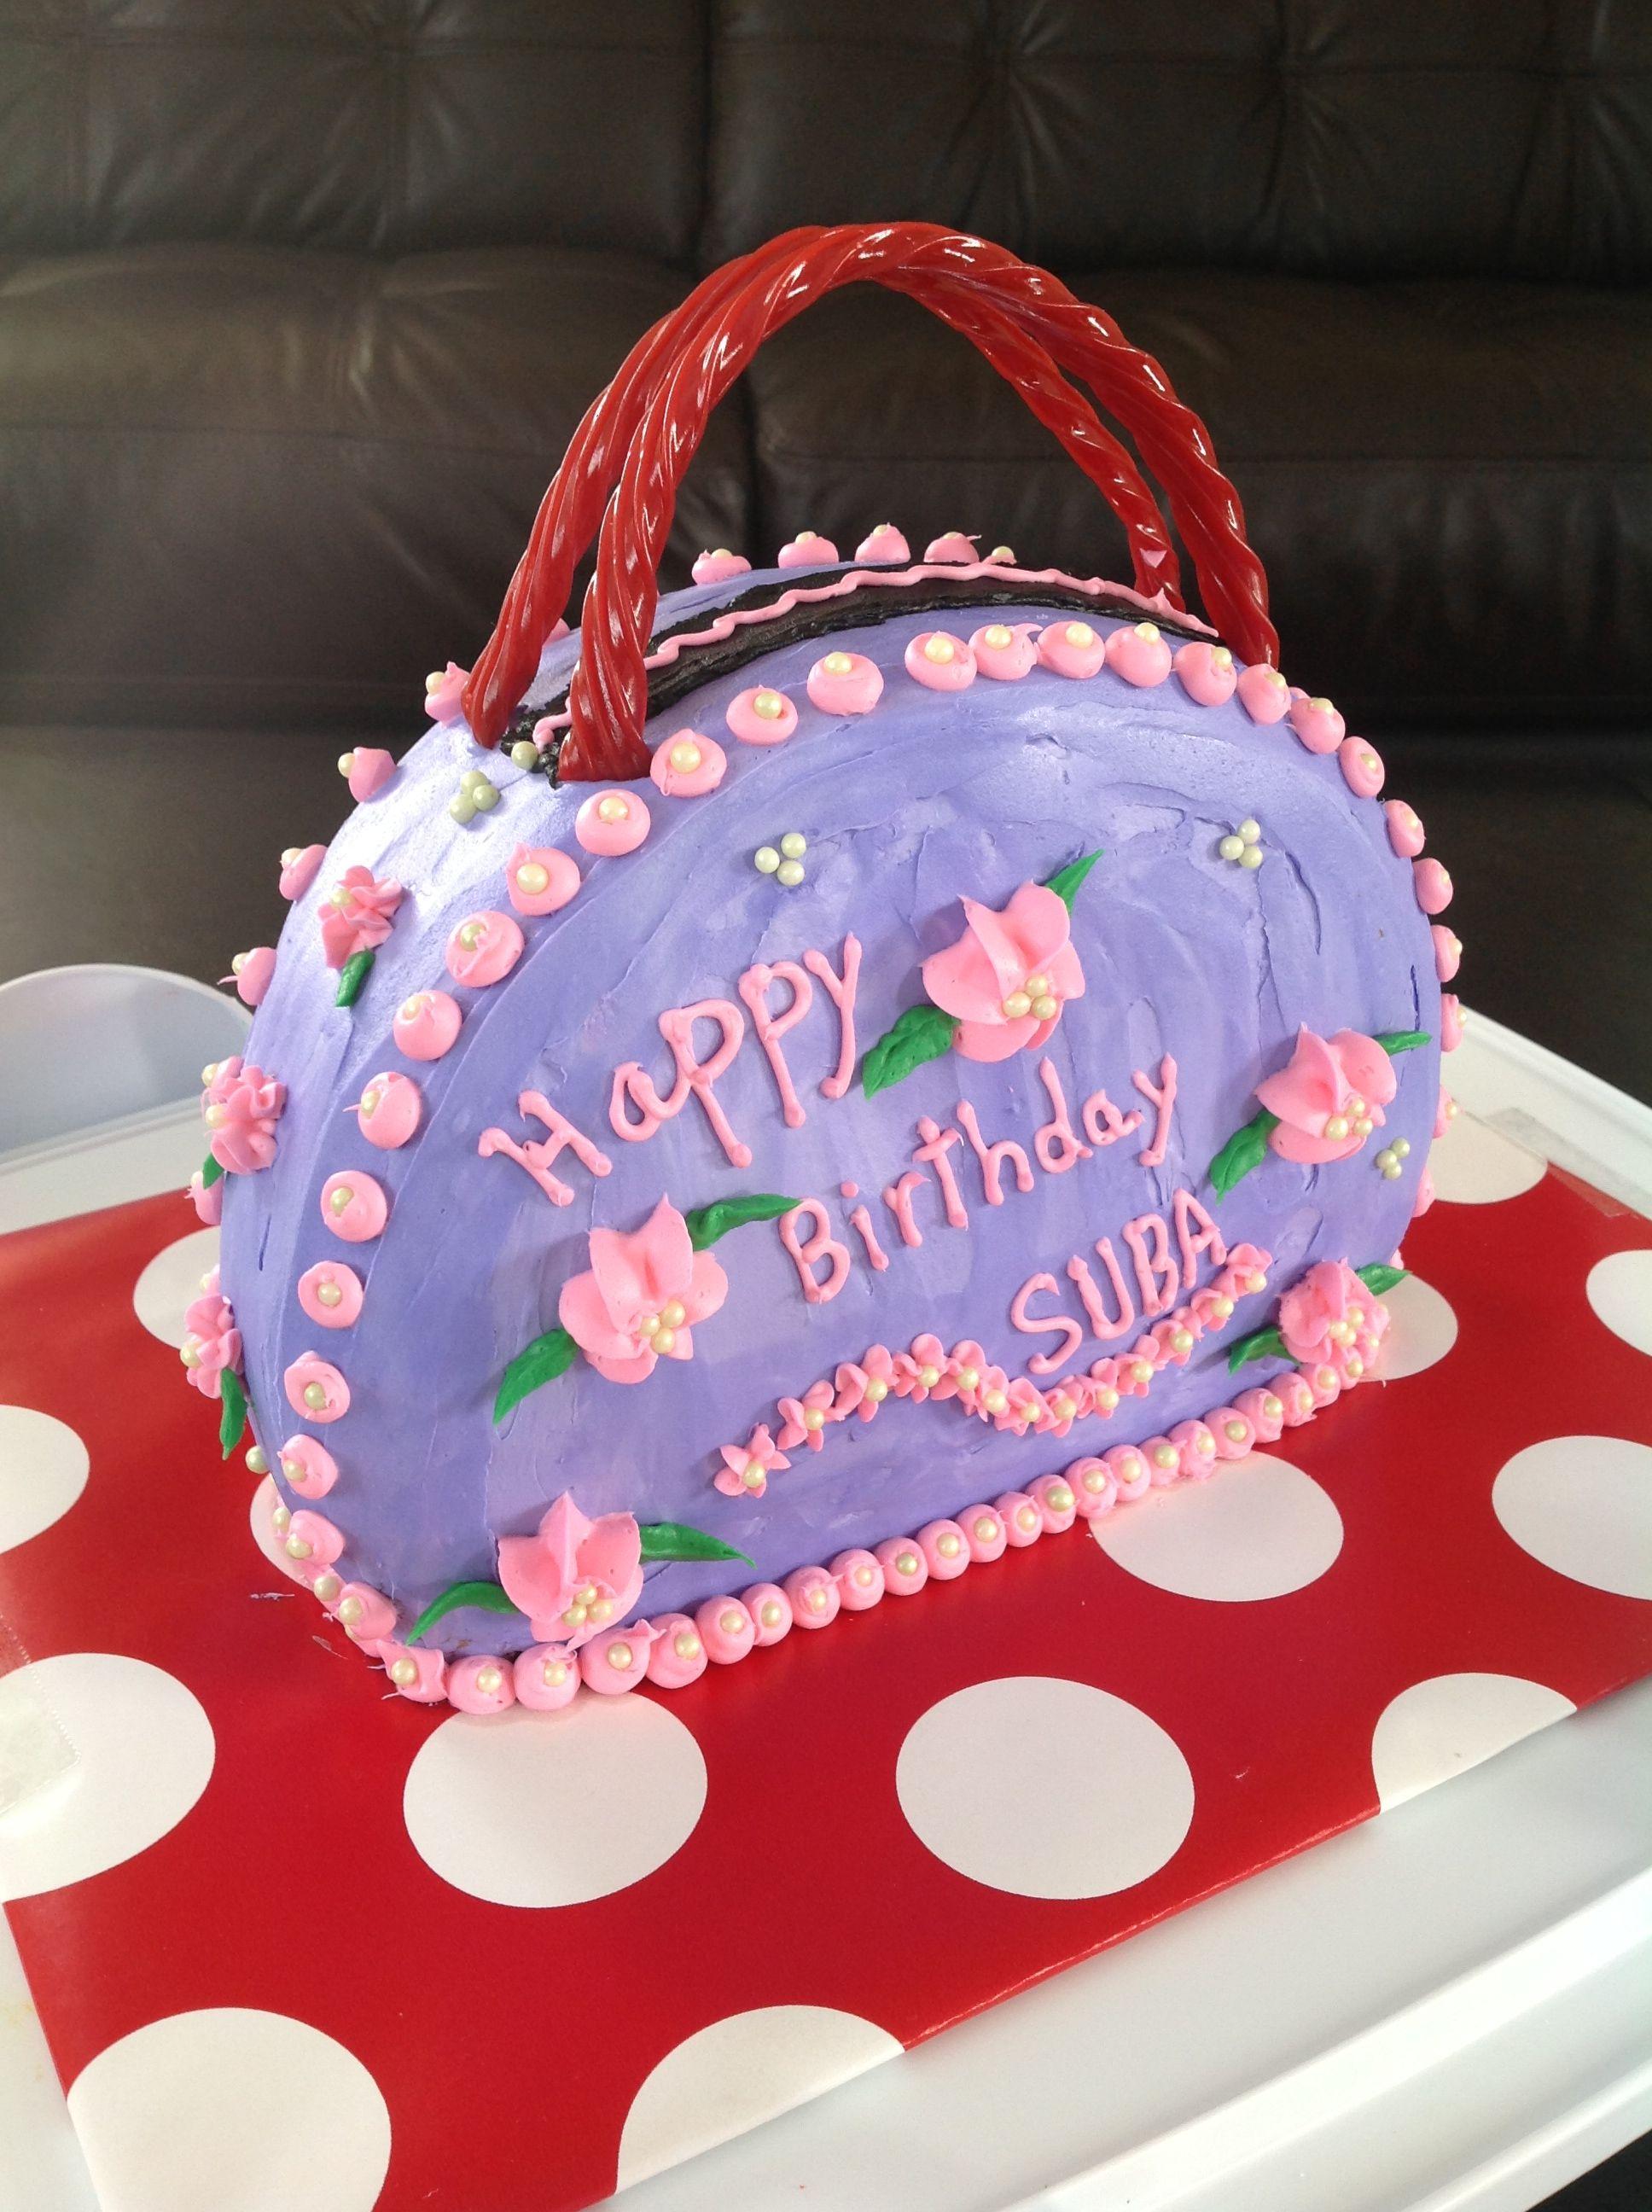 Pleasant Purse For A Shoppers Birthday Yummy Cakes Cake Decorating Cake Funny Birthday Cards Online Benoljebrpdamsfinfo